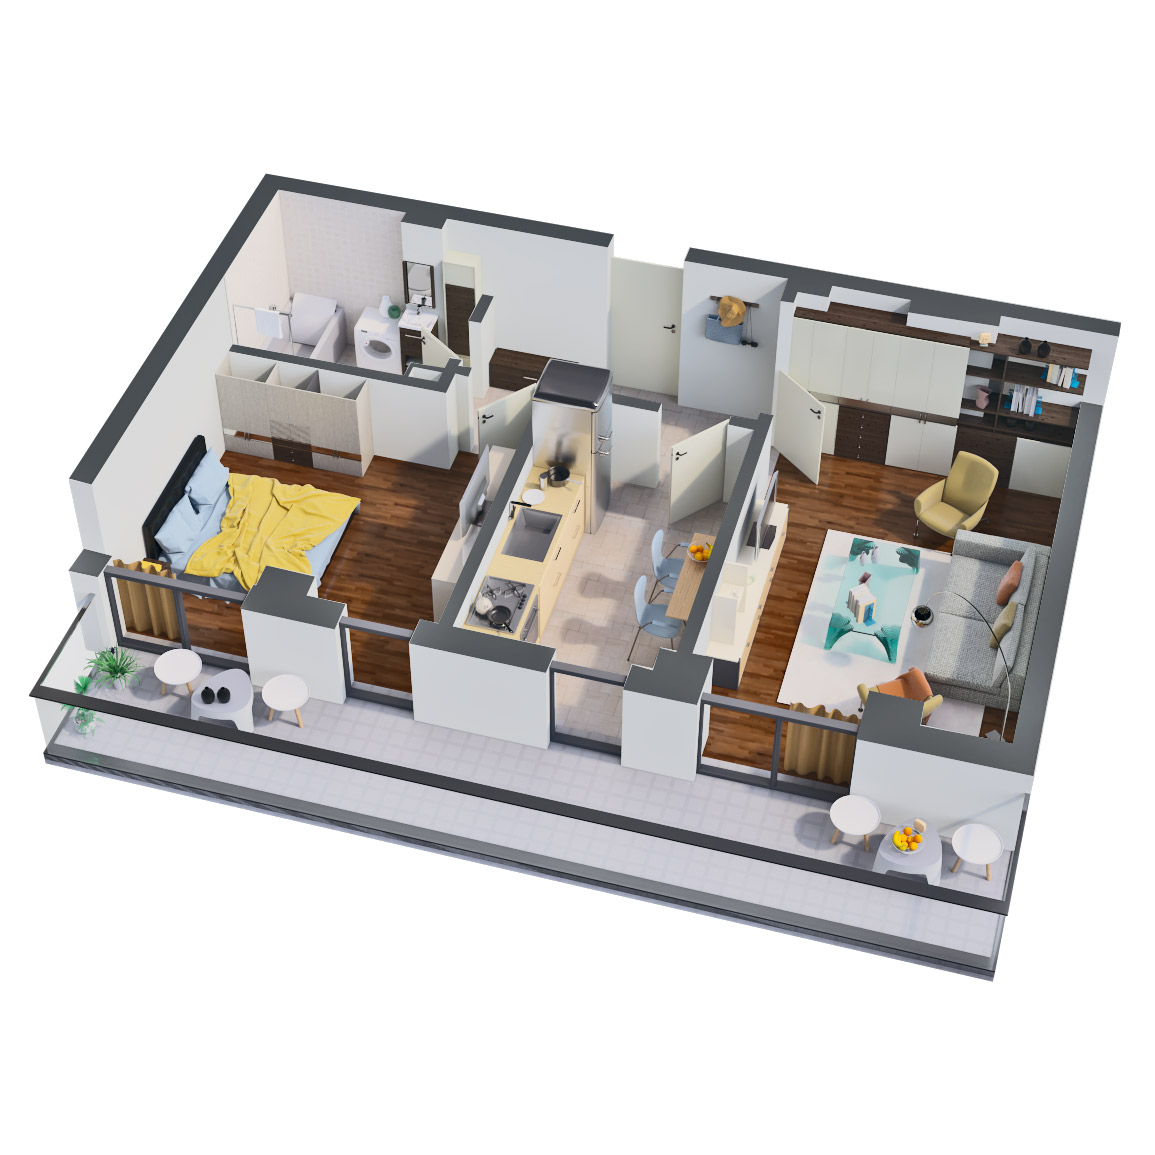 Apartament 2 camere de vanzare Bucuresti - Catedral Residence - Marriott, Piata Unirii, 13 Septembrie, Izvor - Tip 5 - T1 - B